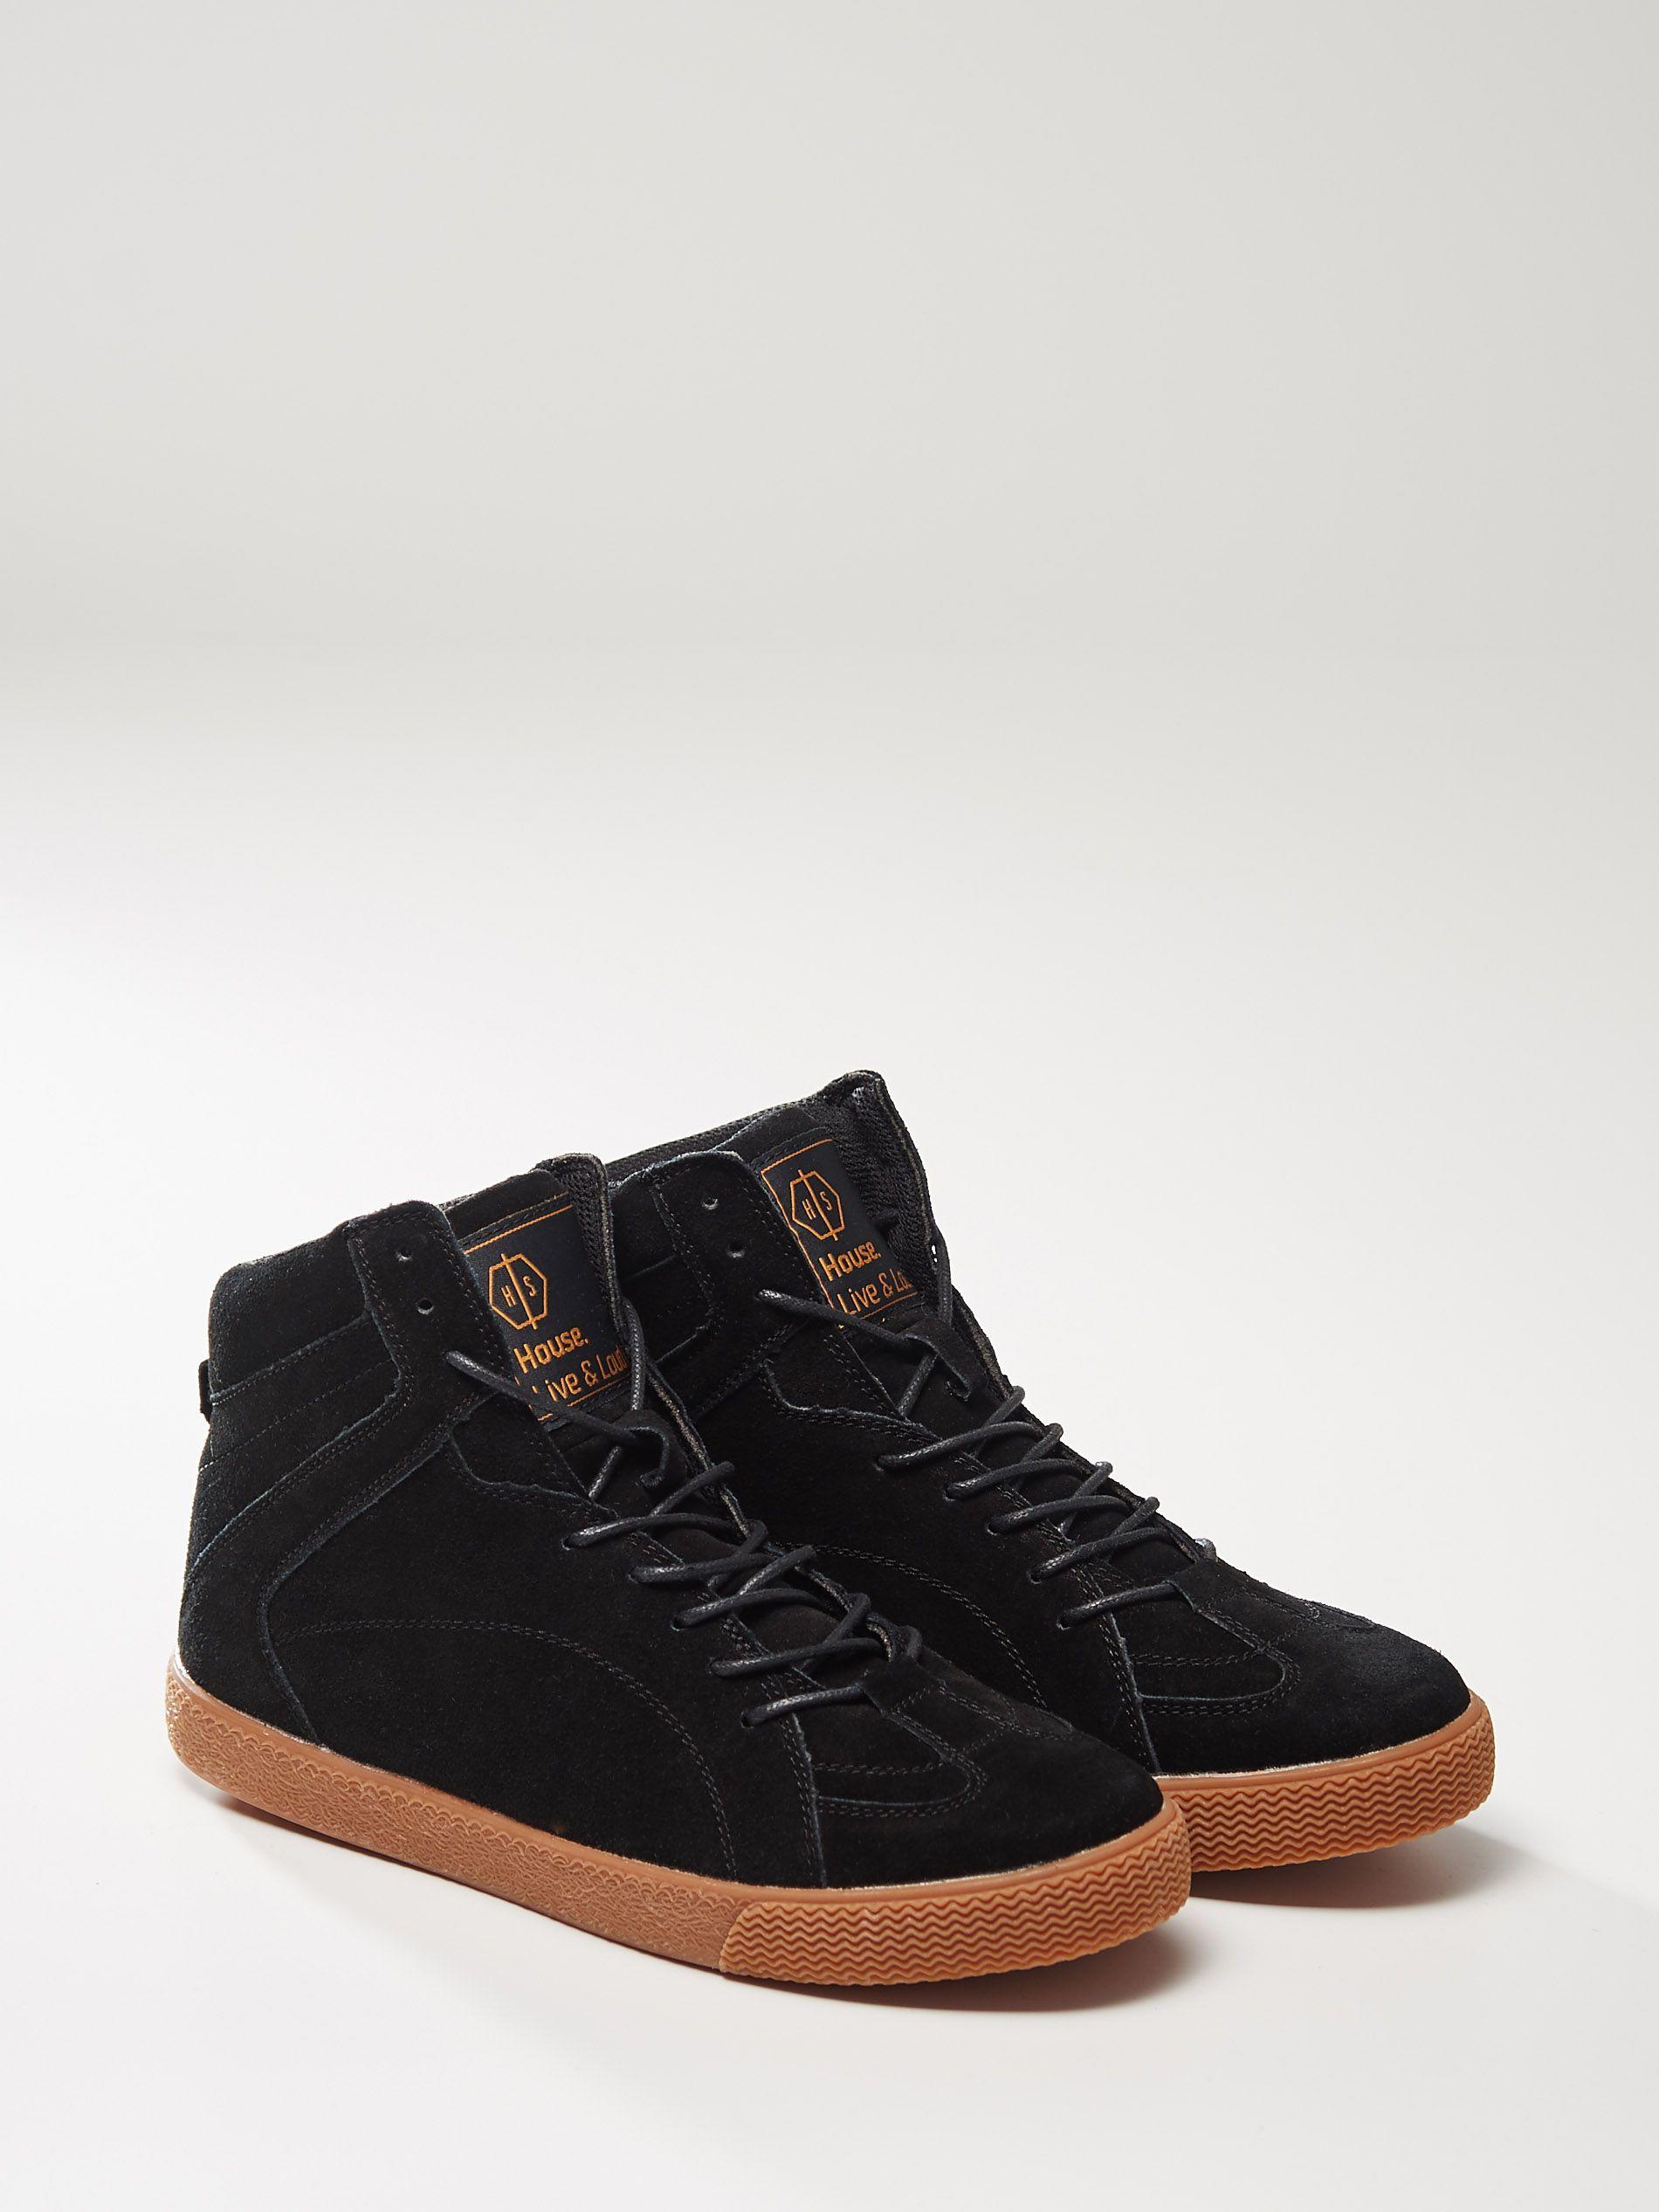 Skorzane Buty Za Kostke House High Ankle Boots Boots Shoes